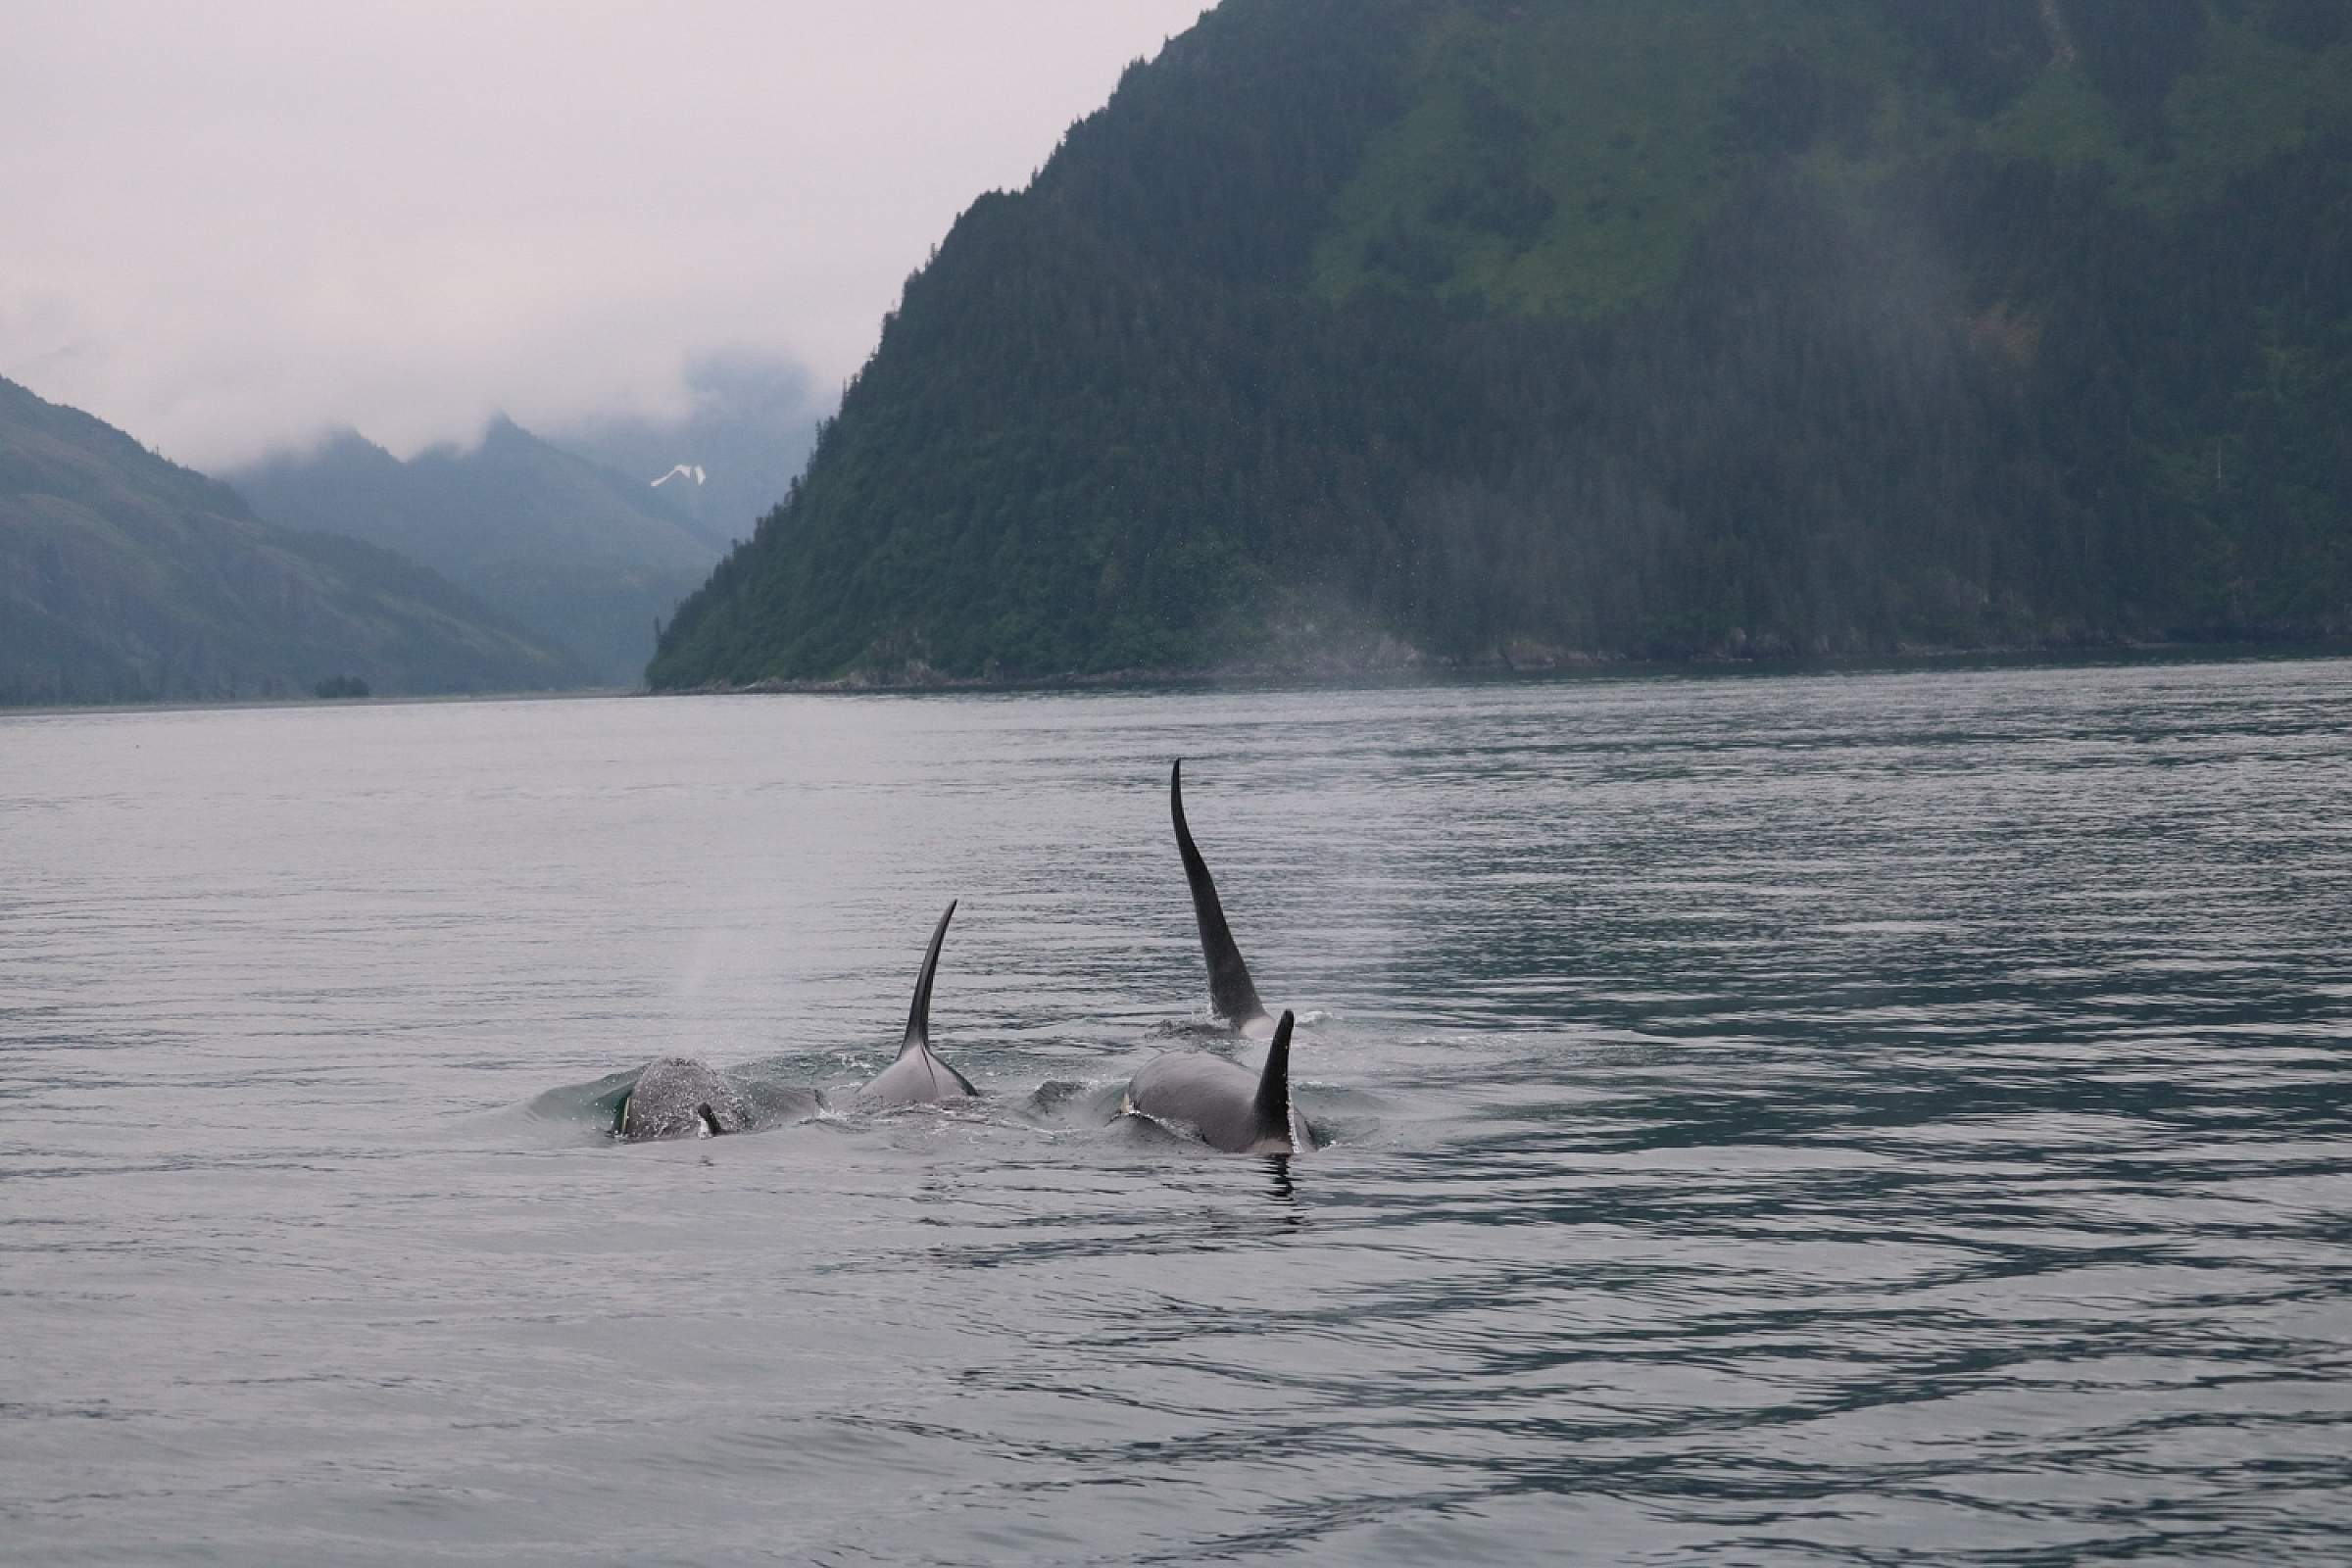 Orcas swimming in Kenai Fjords National Park